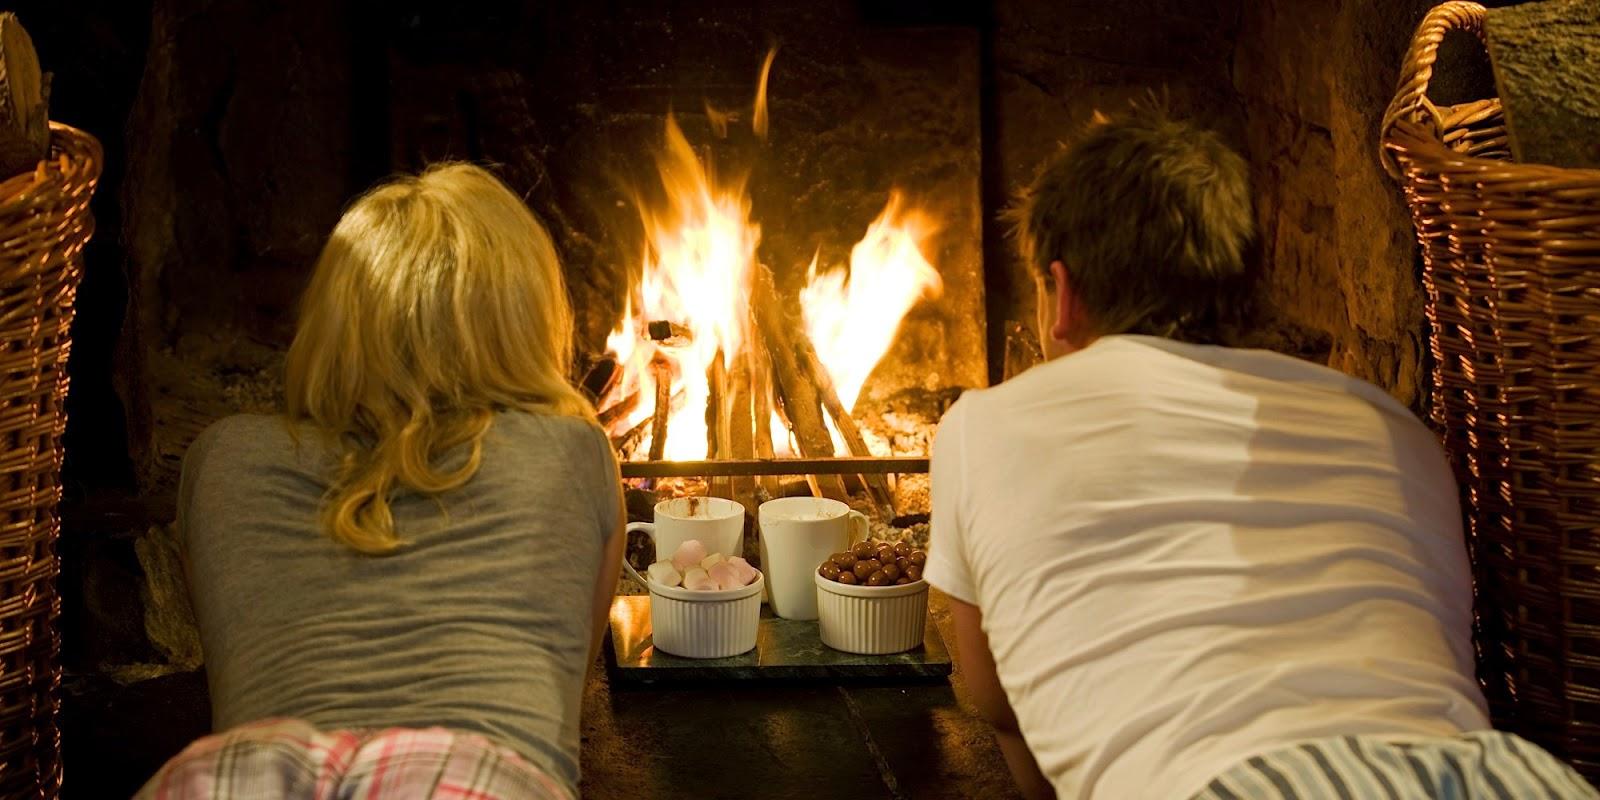 romantic fireplace part 41 wood logs fire burn in fireplace